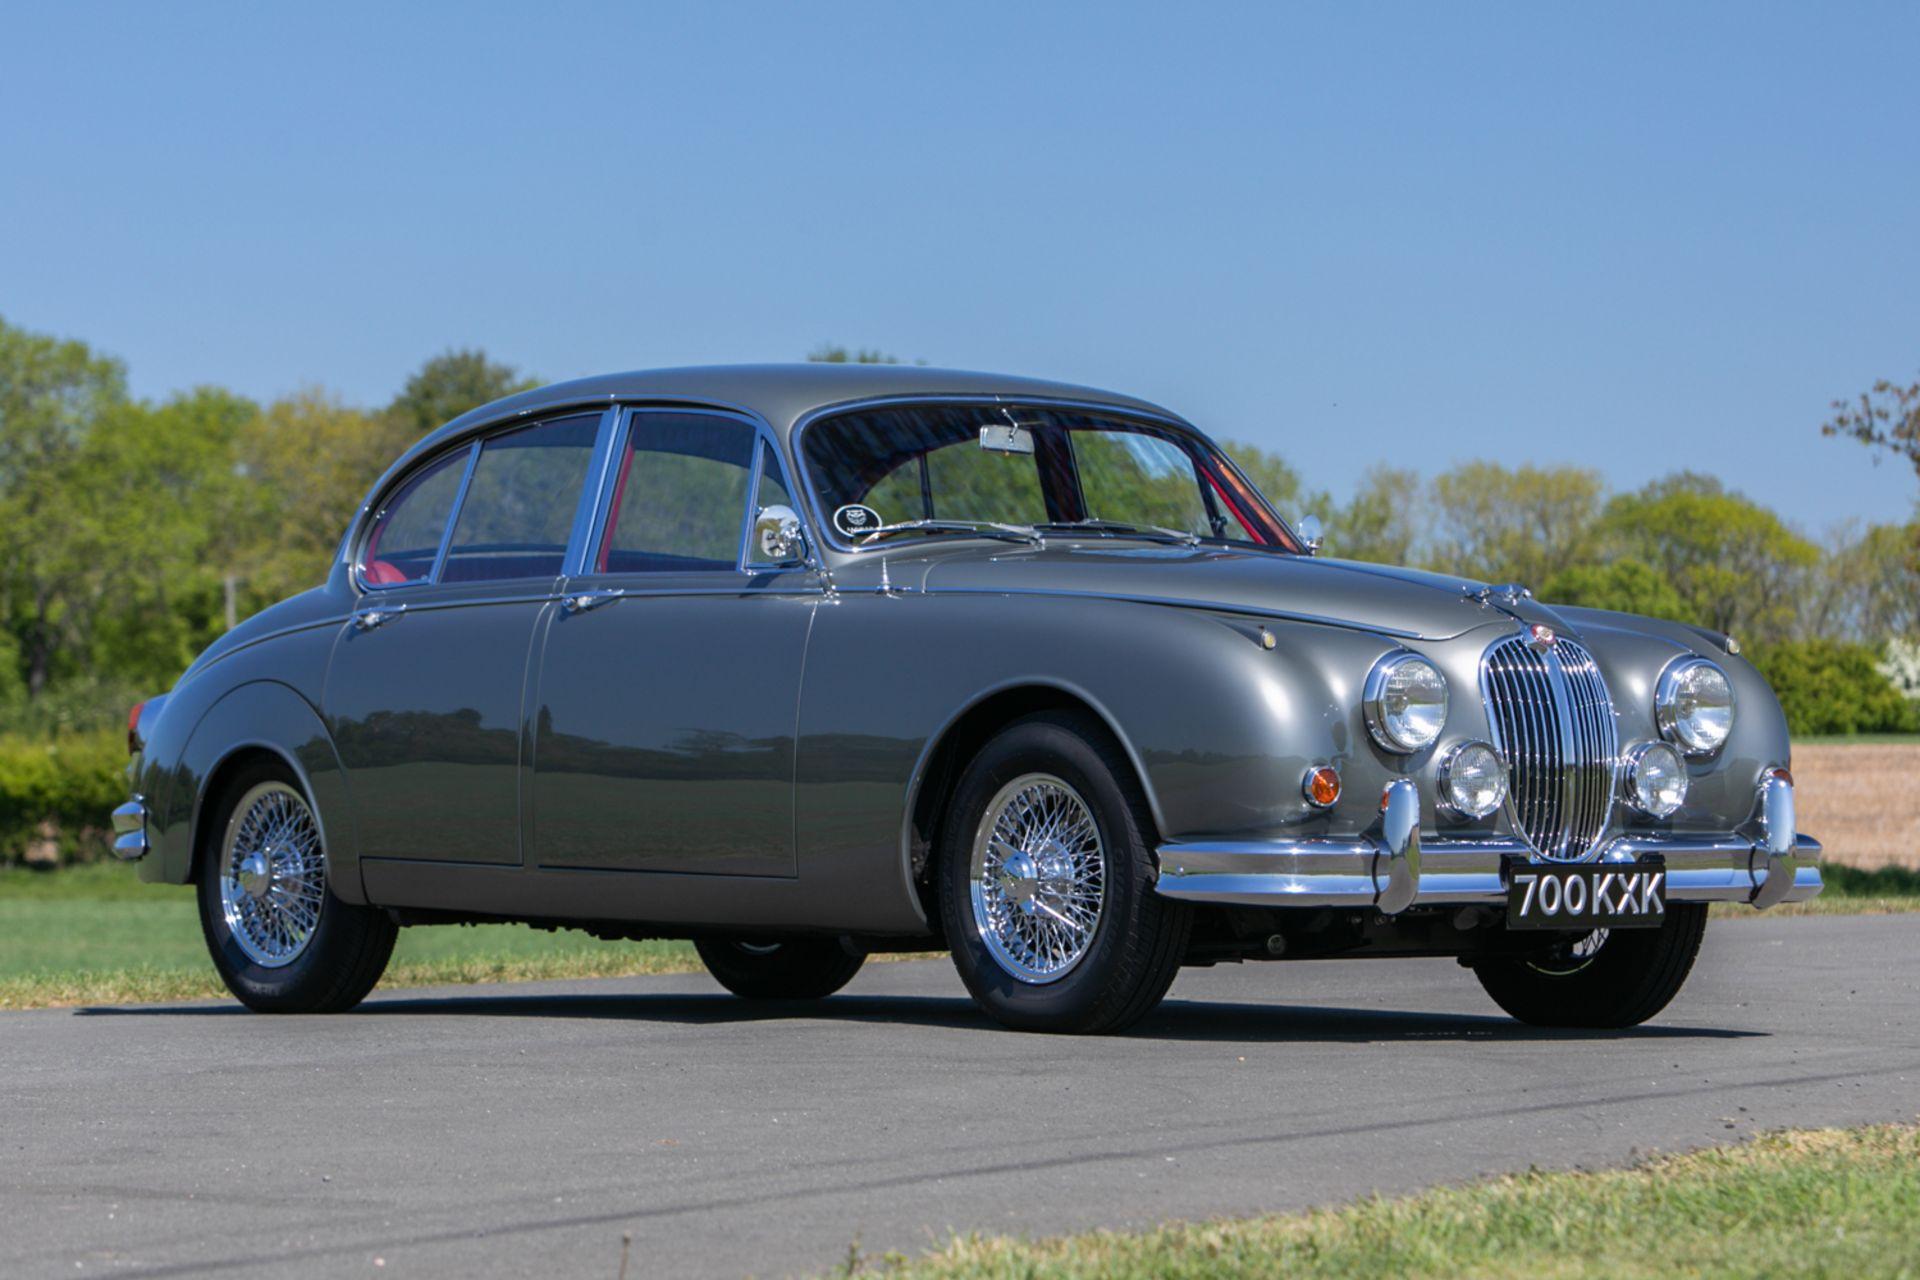 Lot 148 - 1961 Jaguar Mk2 3.8-litre manual/overdrive